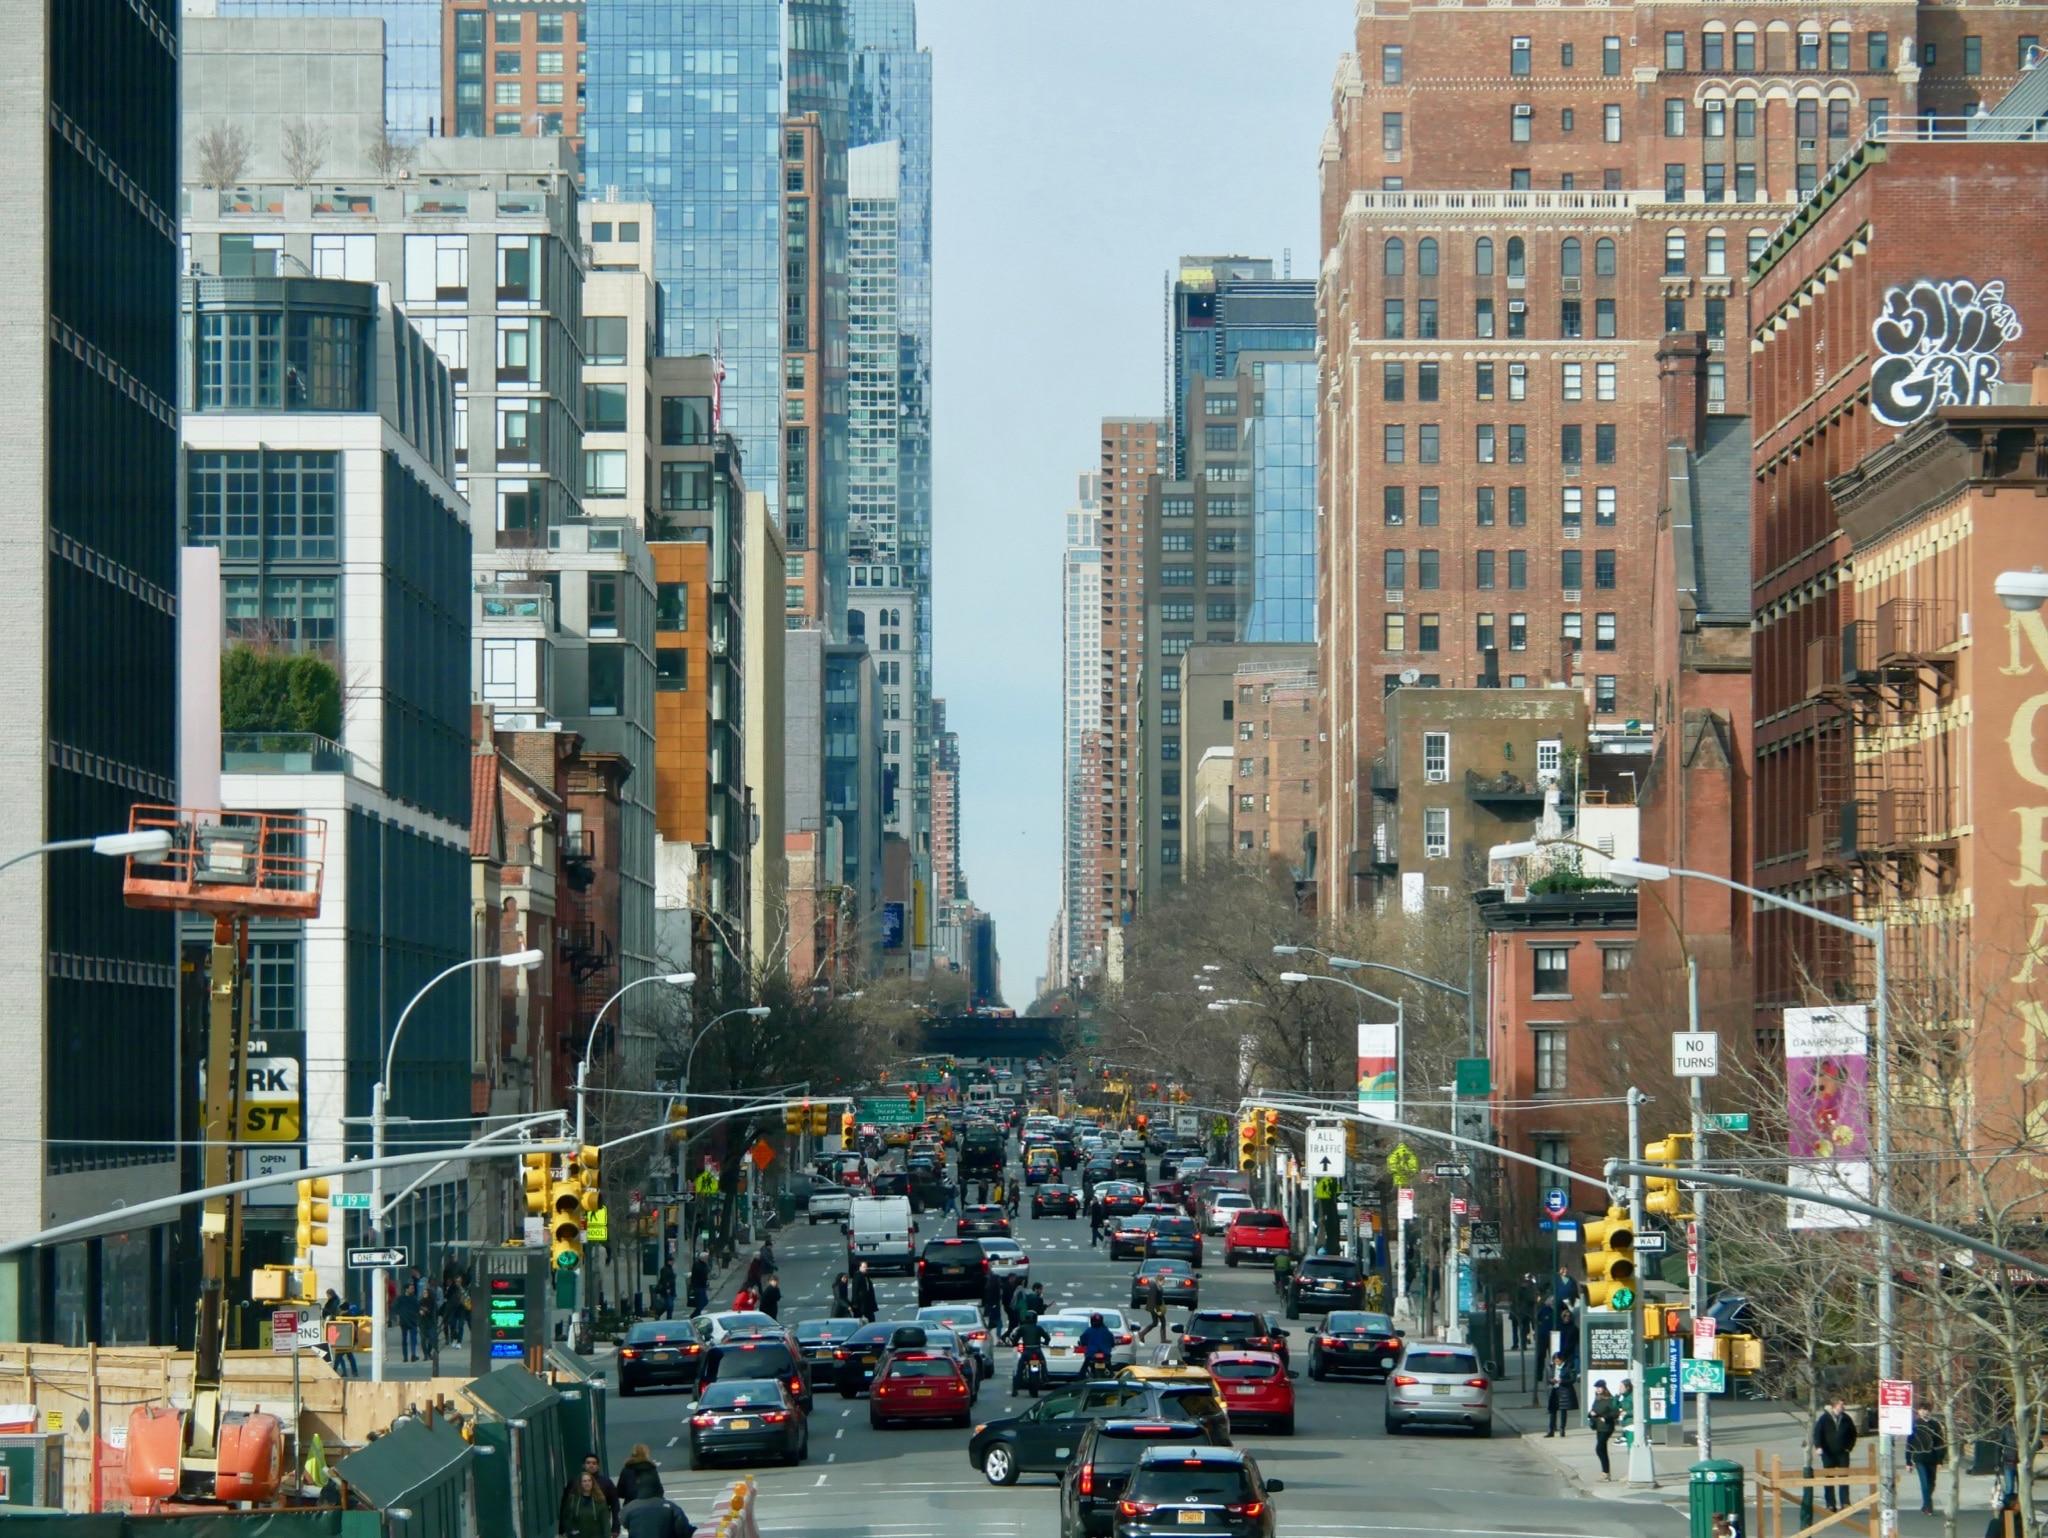 New York - High Line - 10th Avenue